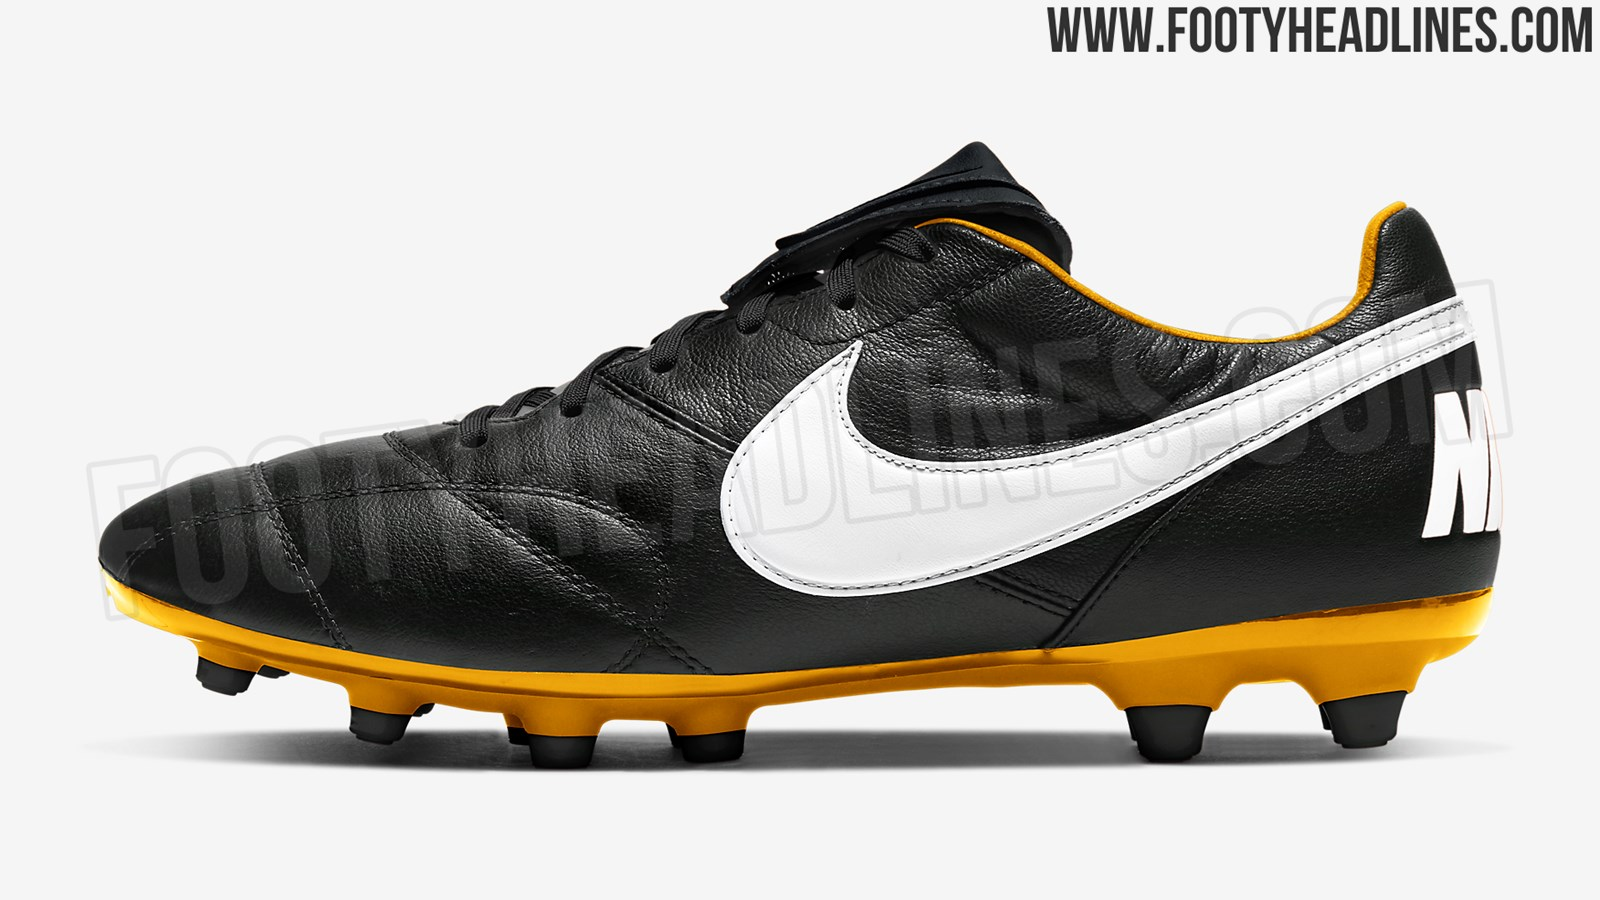 Stunning Tiempo Premier 94 Inspired Nike Premier Ii Boots